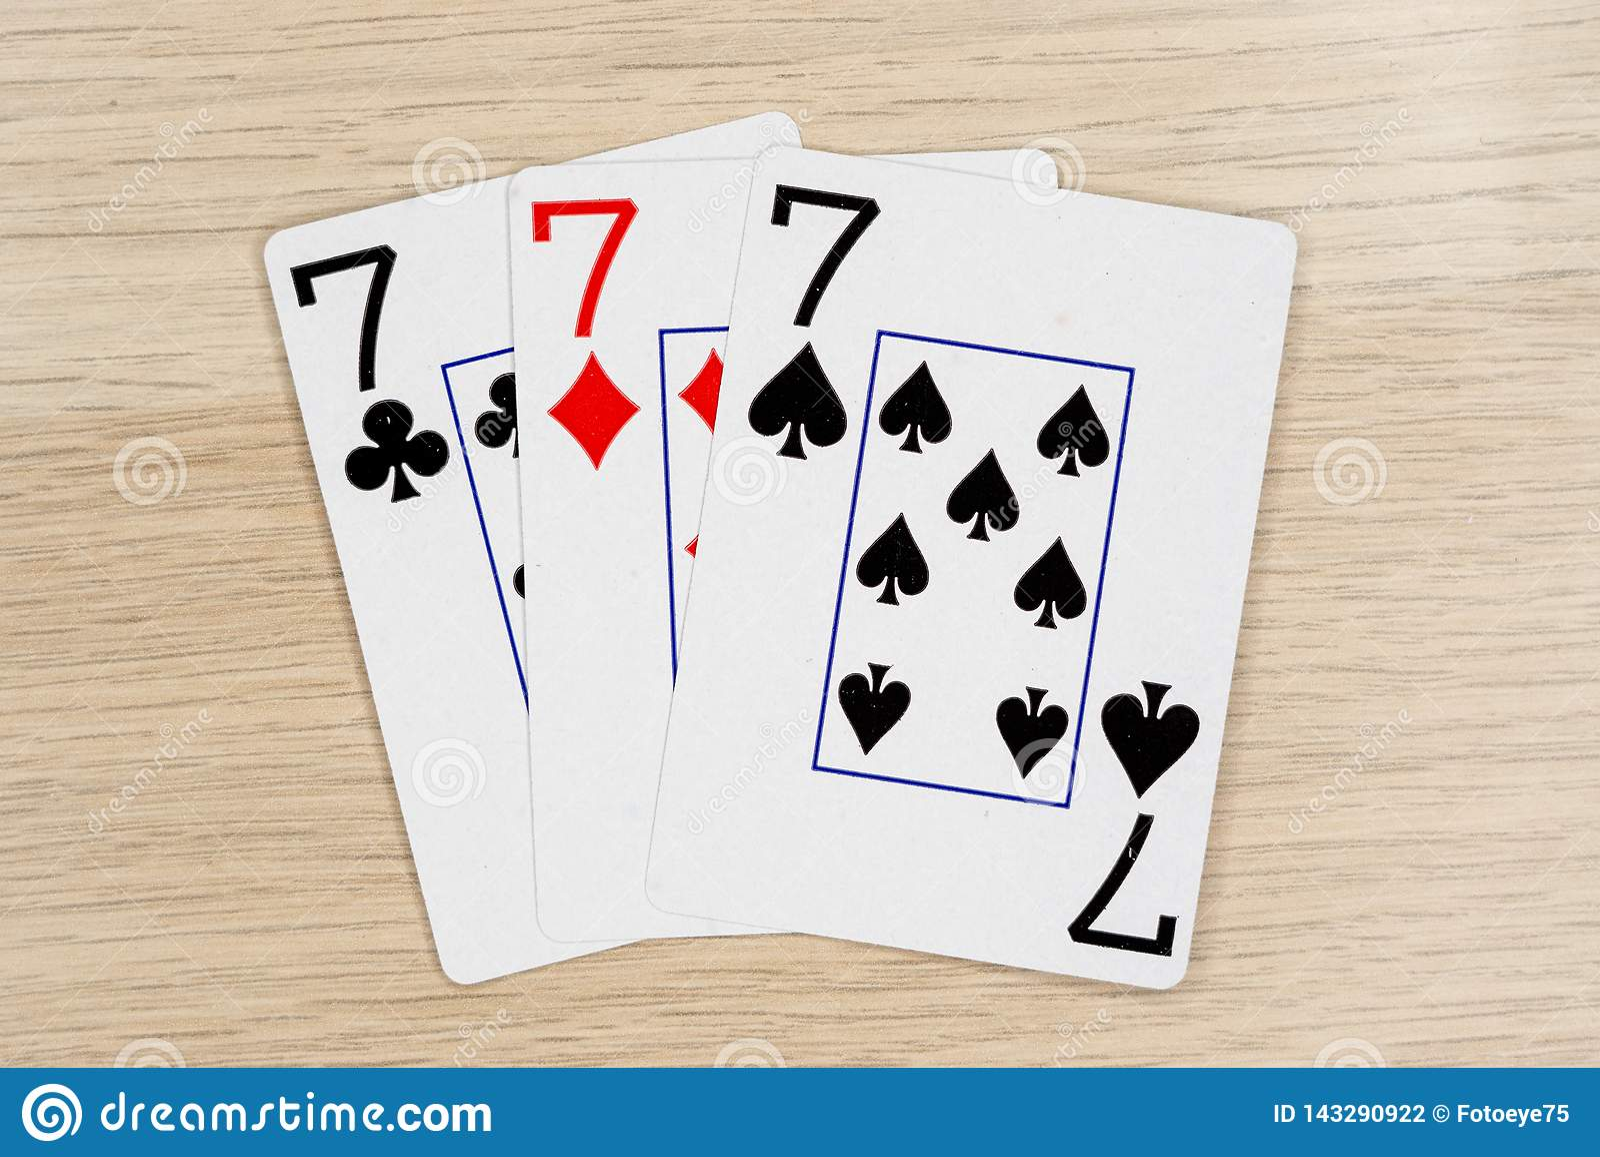 3 Of A Kind Poker